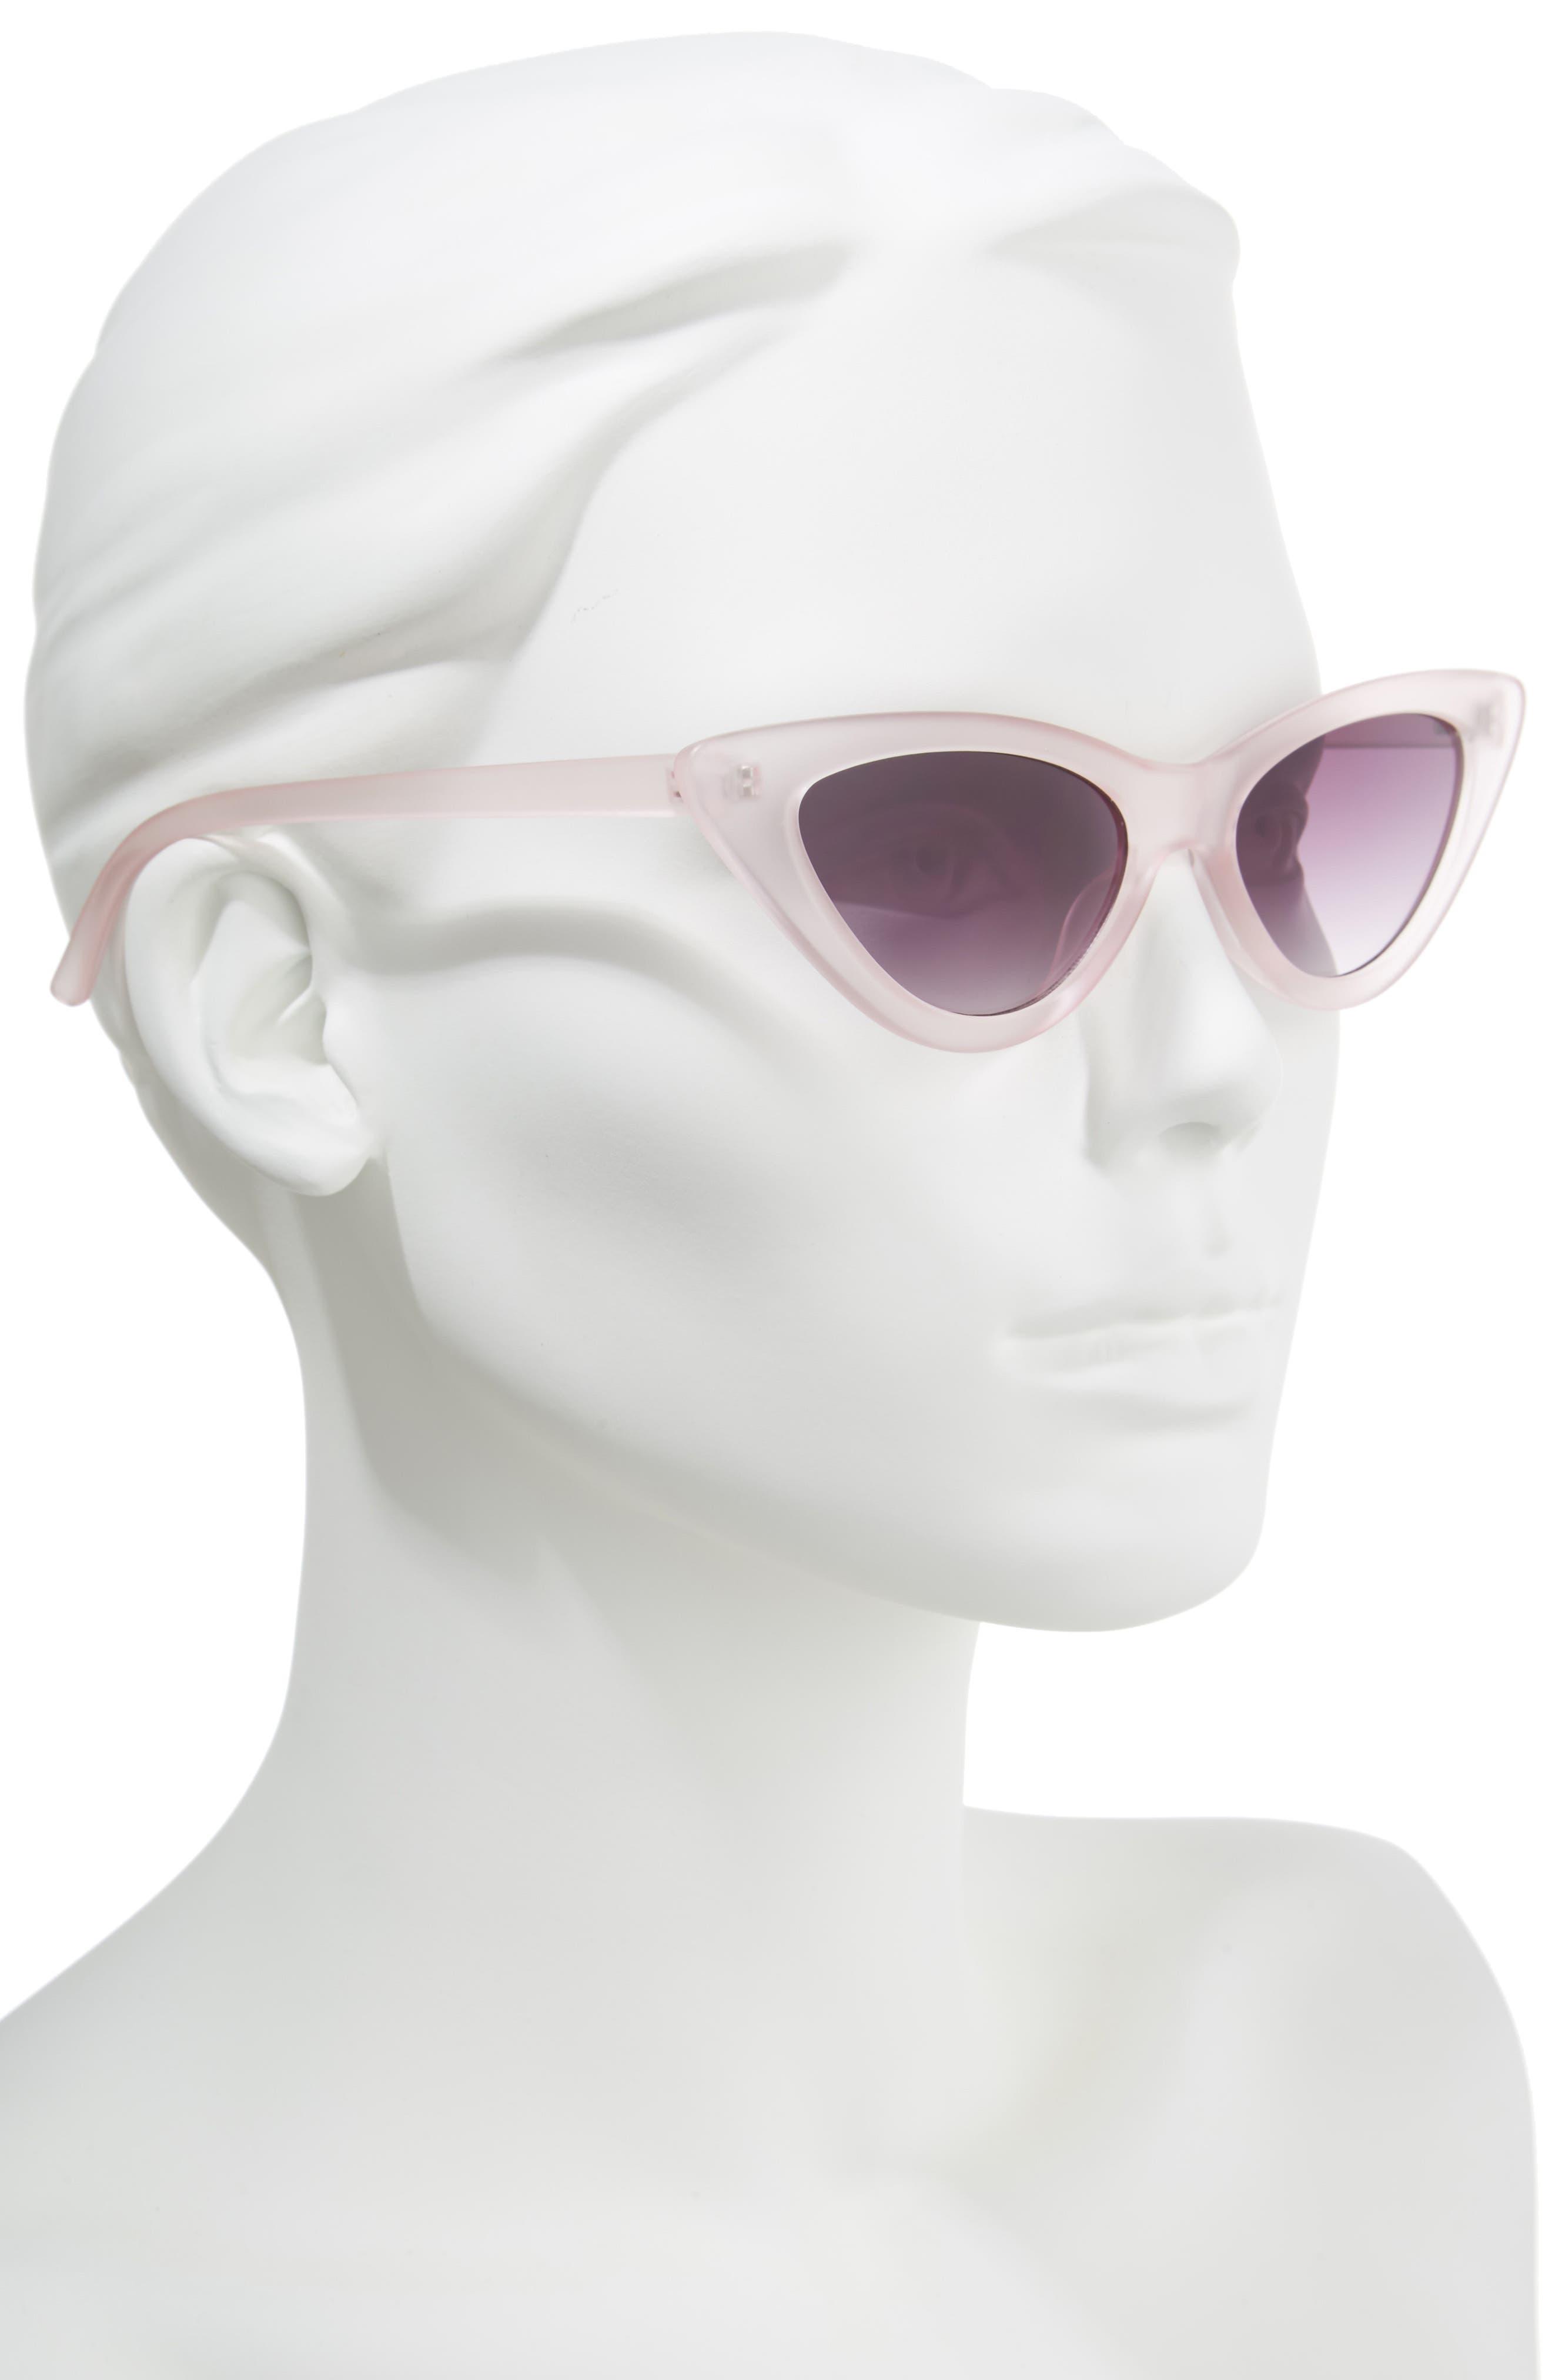 62mm Cat Eye Sunglasses,                             Alternate thumbnail 6, color,